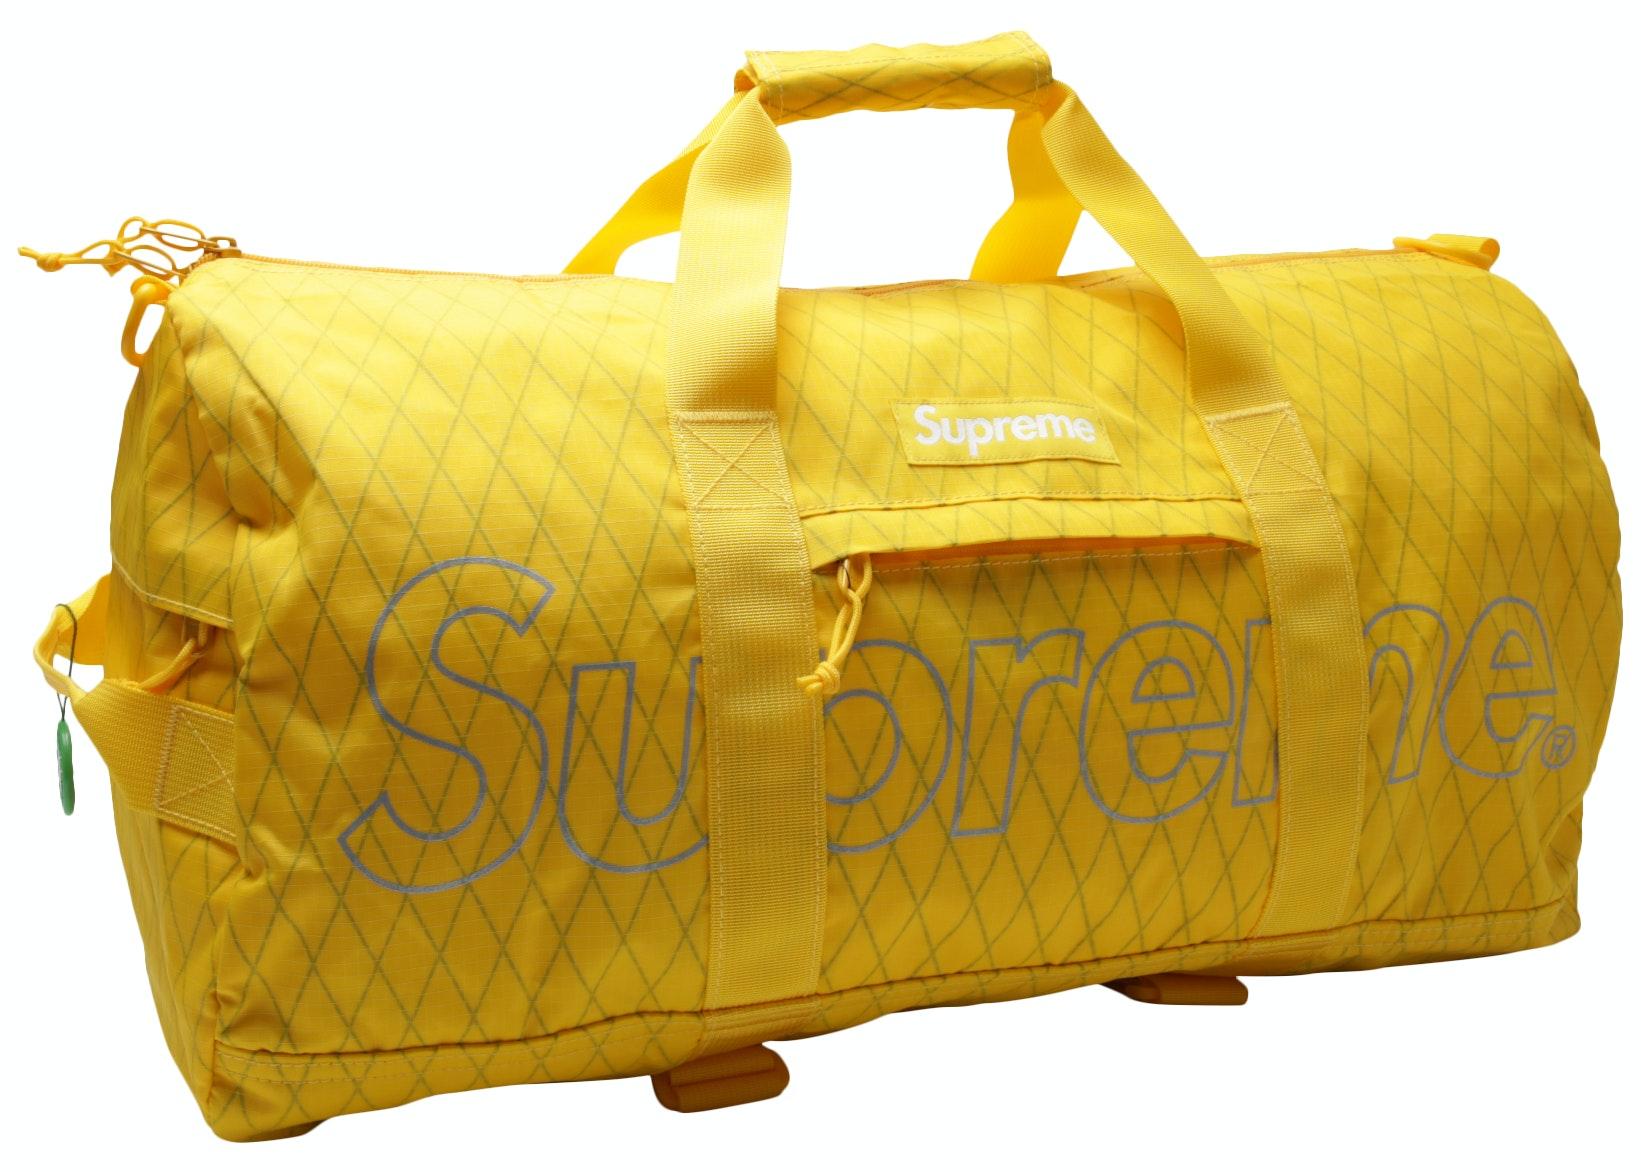 Streetwear Supreme Bags Release Date